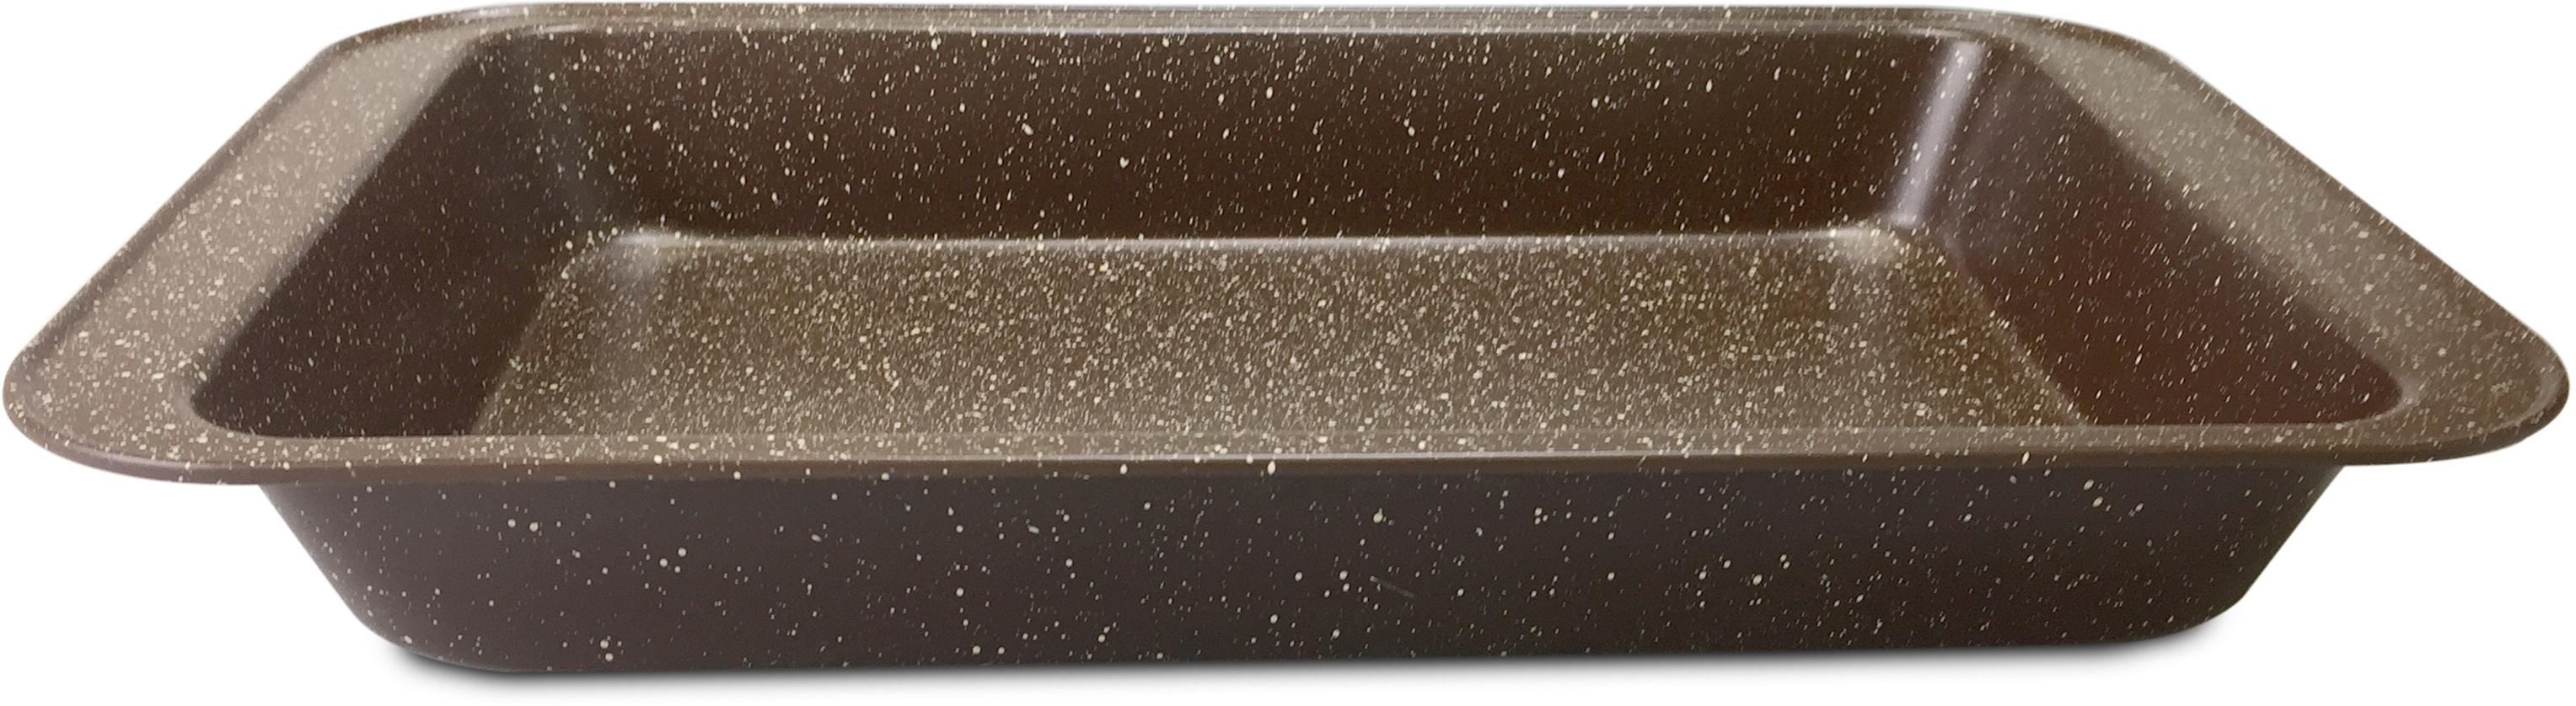 Противень MoulinvillaBrownstone, 36,5 х 24,7 х 5,4 см нож универсальный 12 5 см moulinvilla granate utility kgu 012